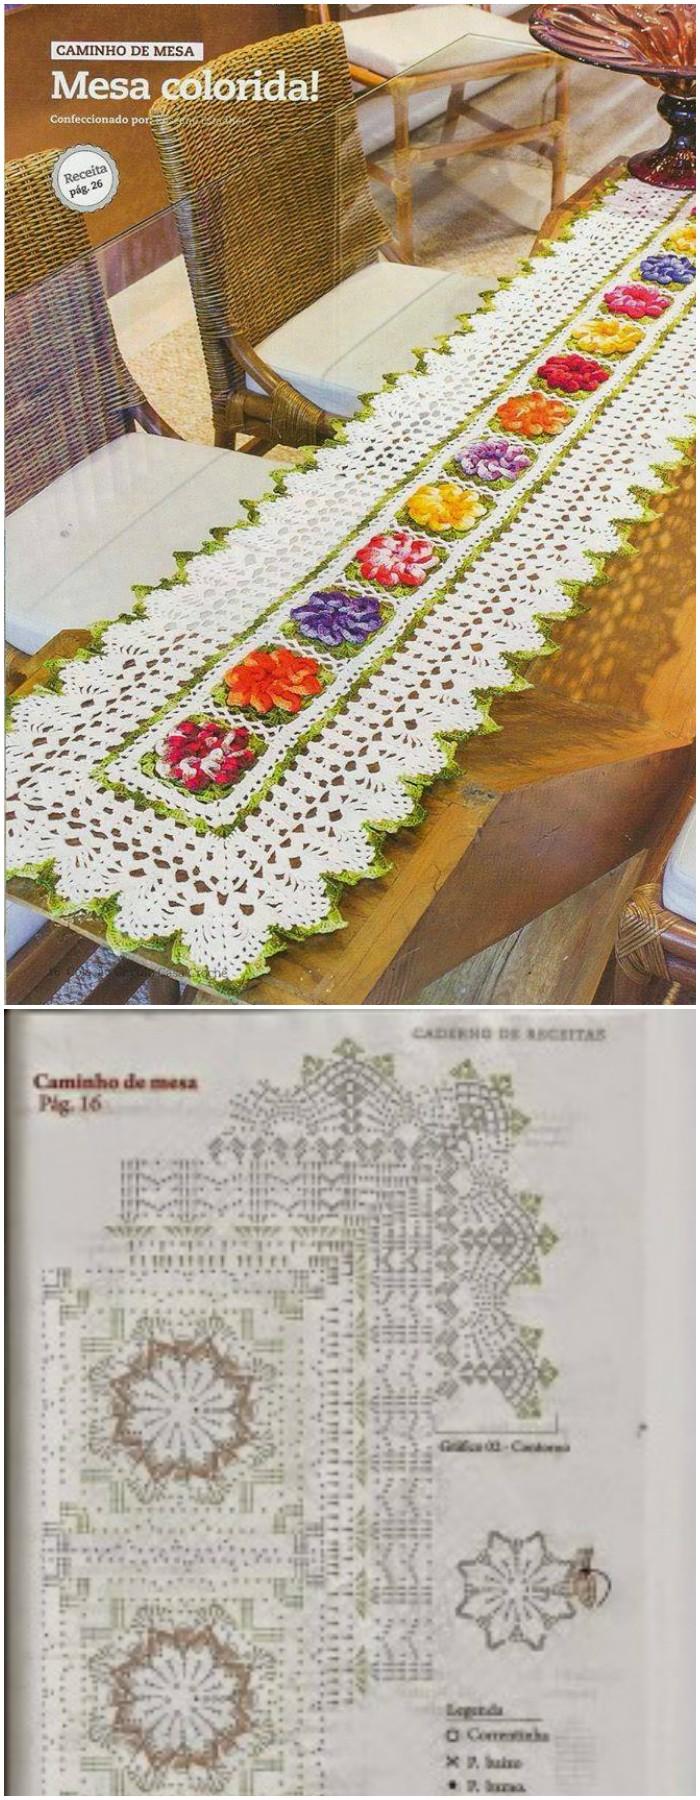 Crochet Table Runner Pattern U2013 Colorful Flowers Gorgeous Crochet Table  Runner Free Patterns